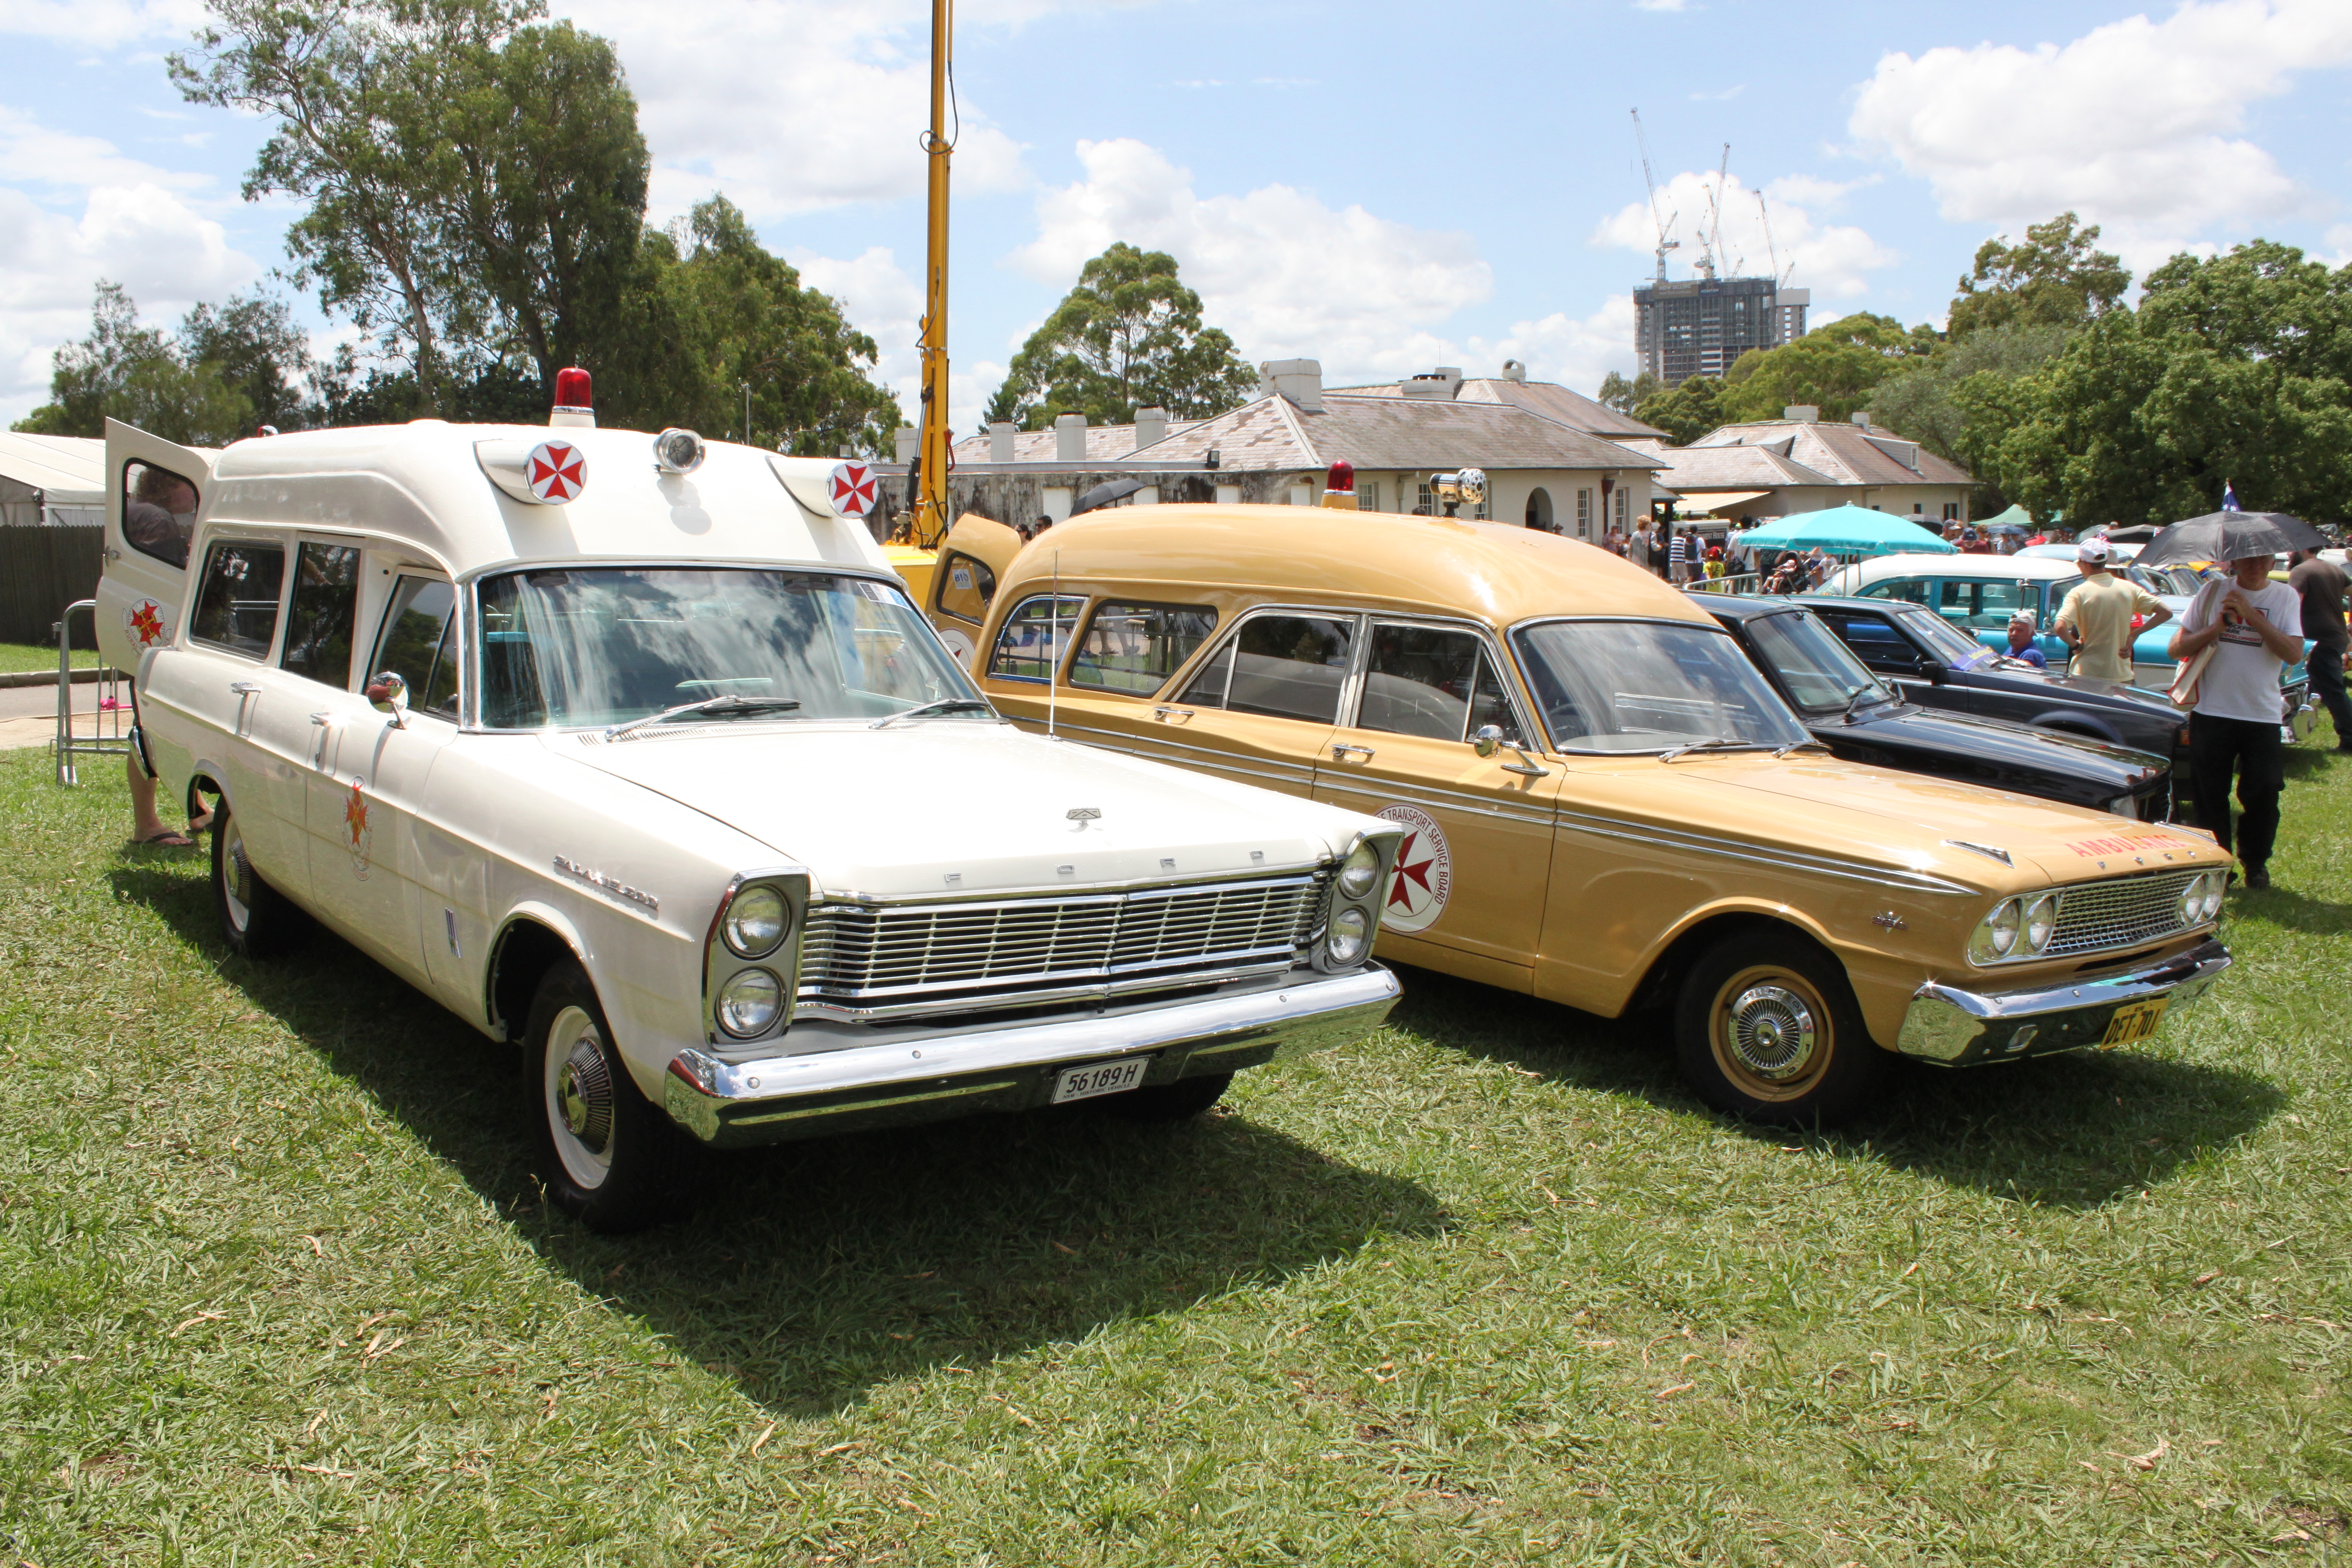 File:1965 Ford Galaxie Ambulance & 1963 Ford Fairlane FC